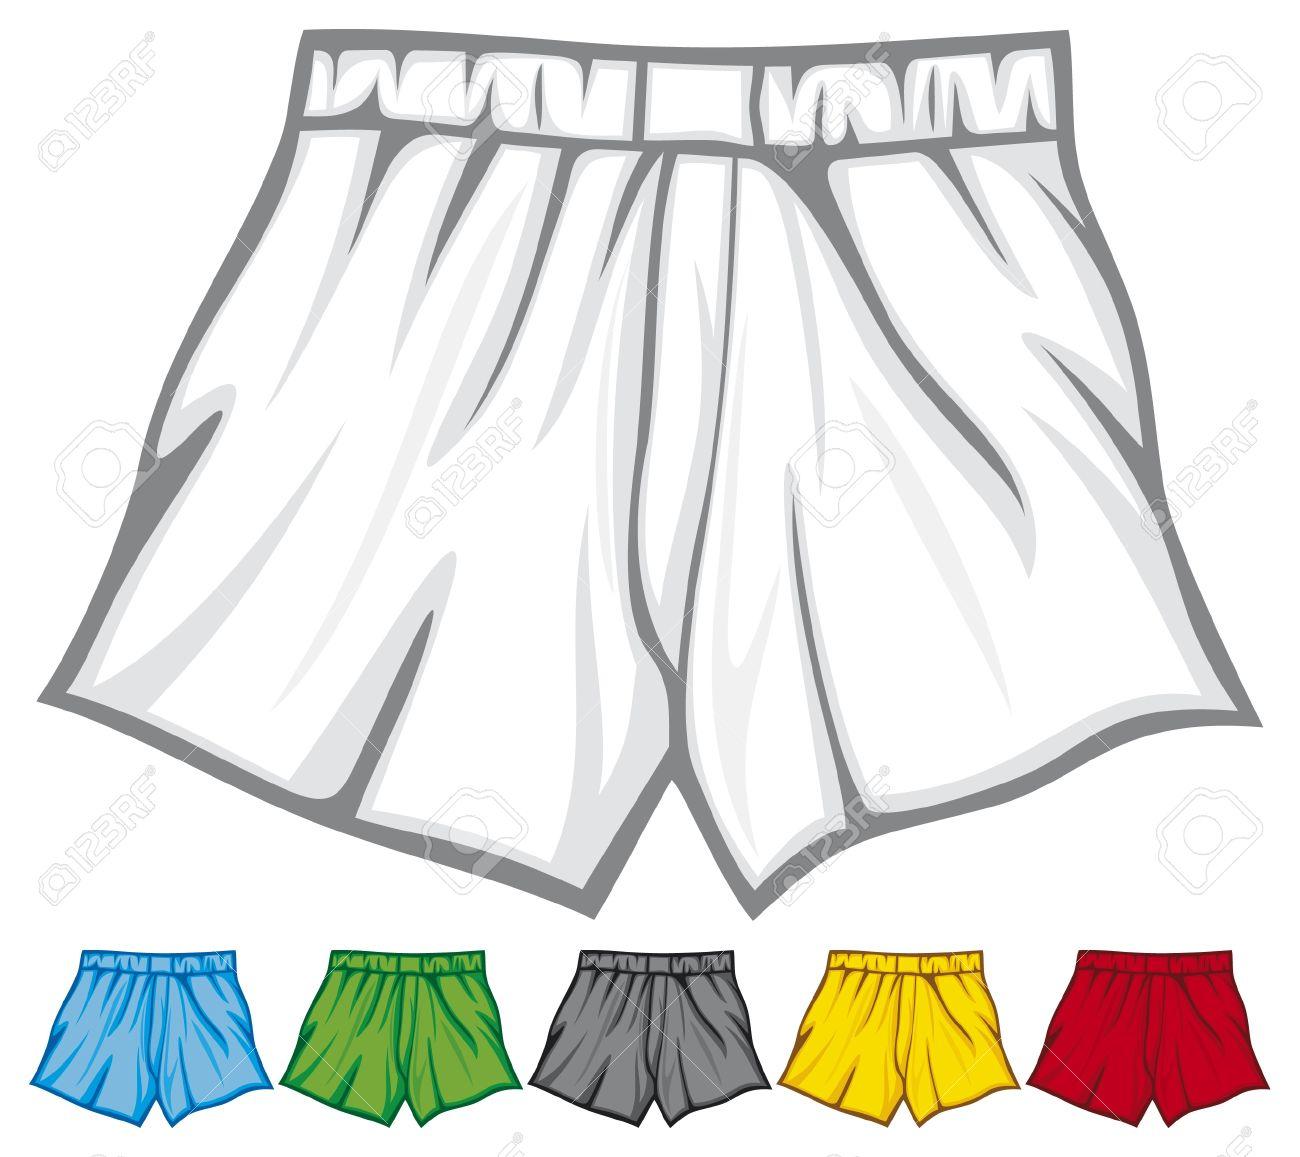 underwear clipart images - photo #50